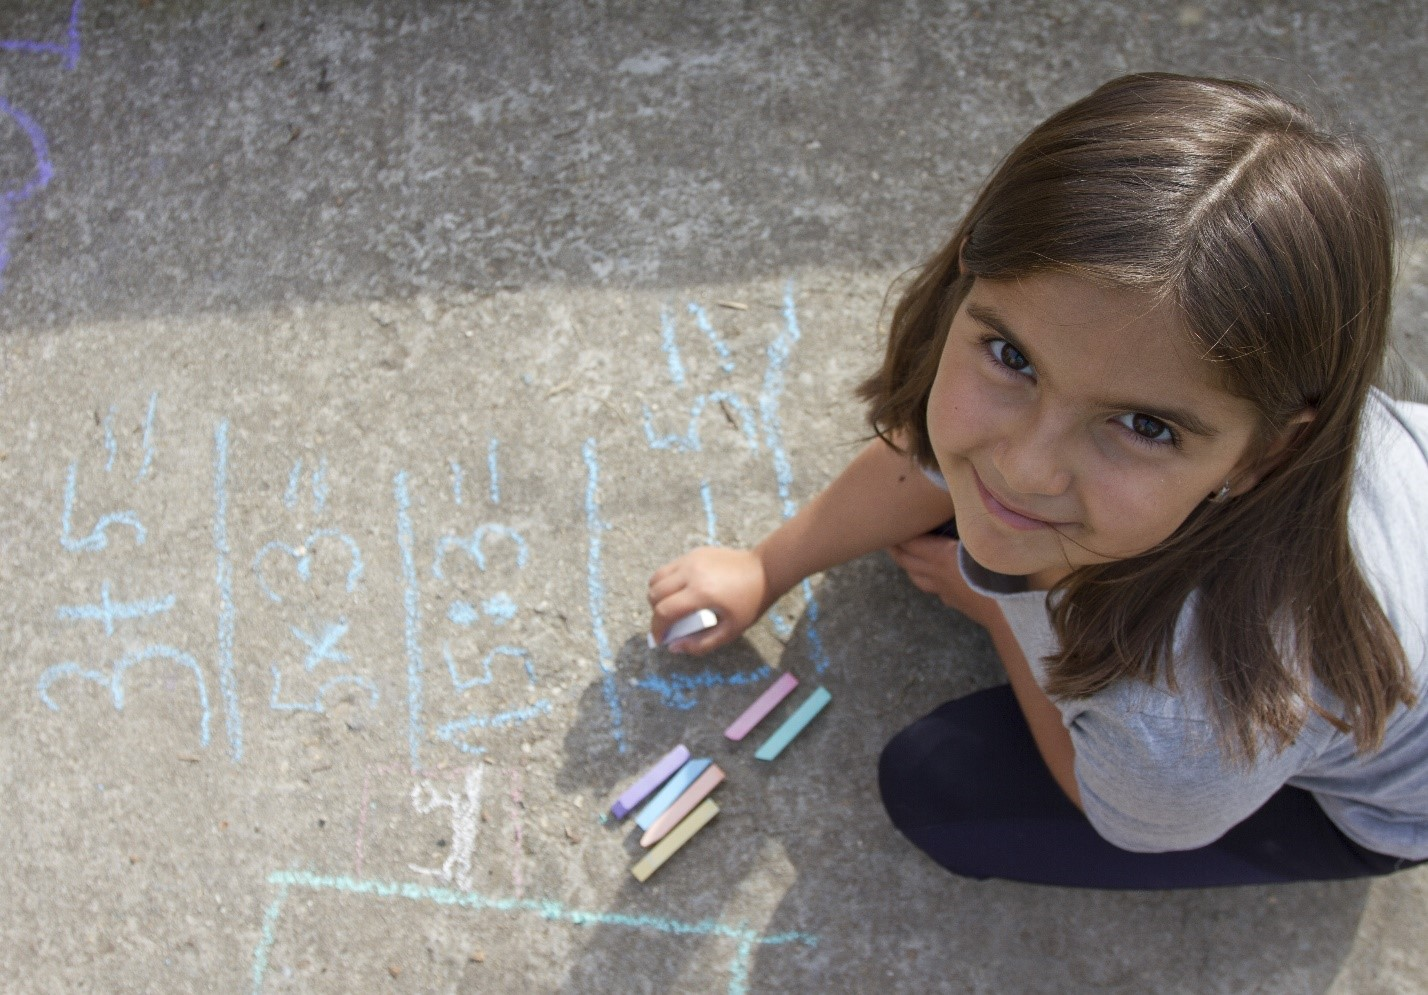 5 Chalk Activities for STEM Fun